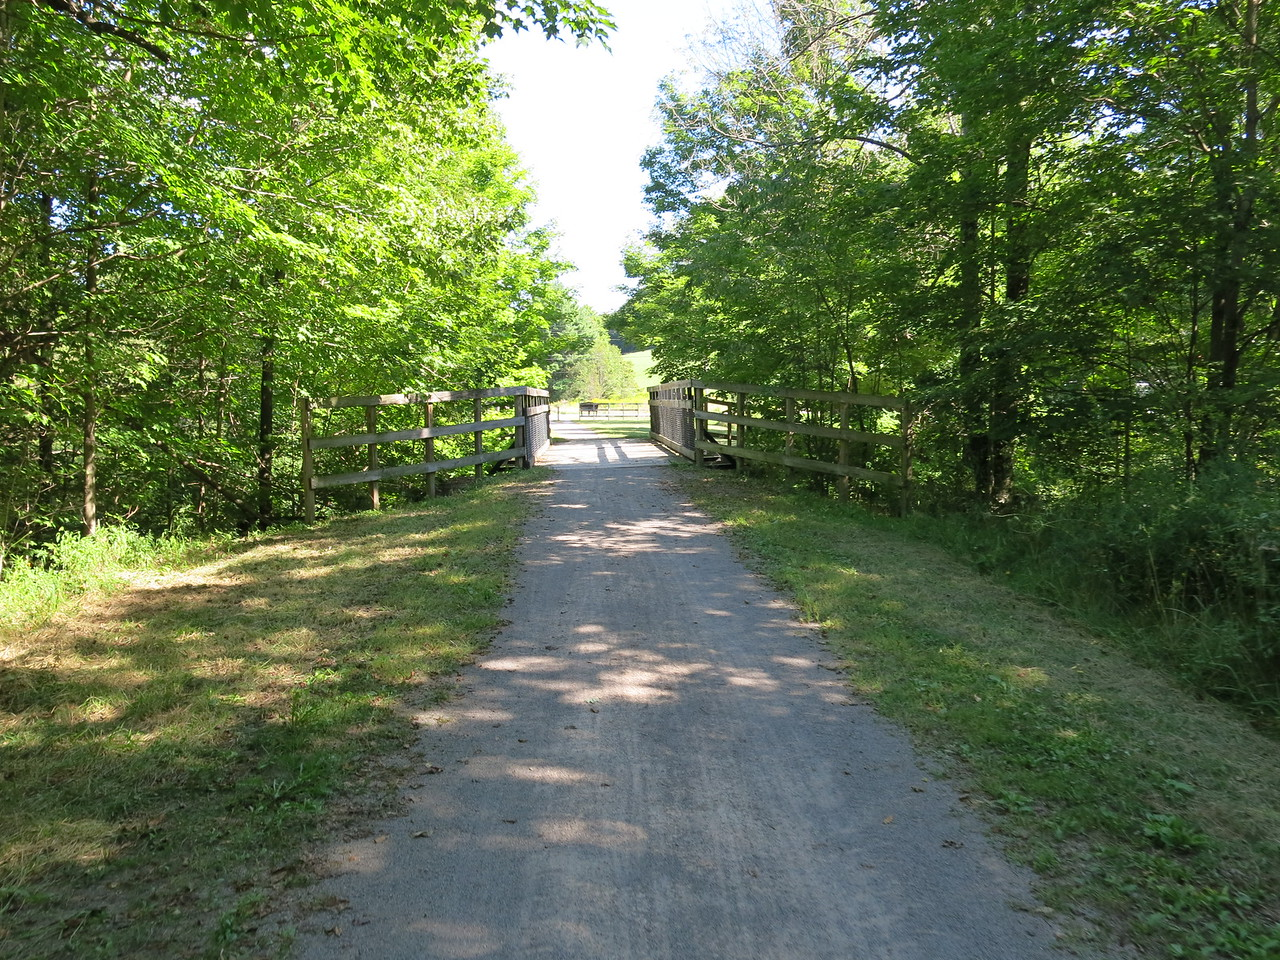 Still another short bridge